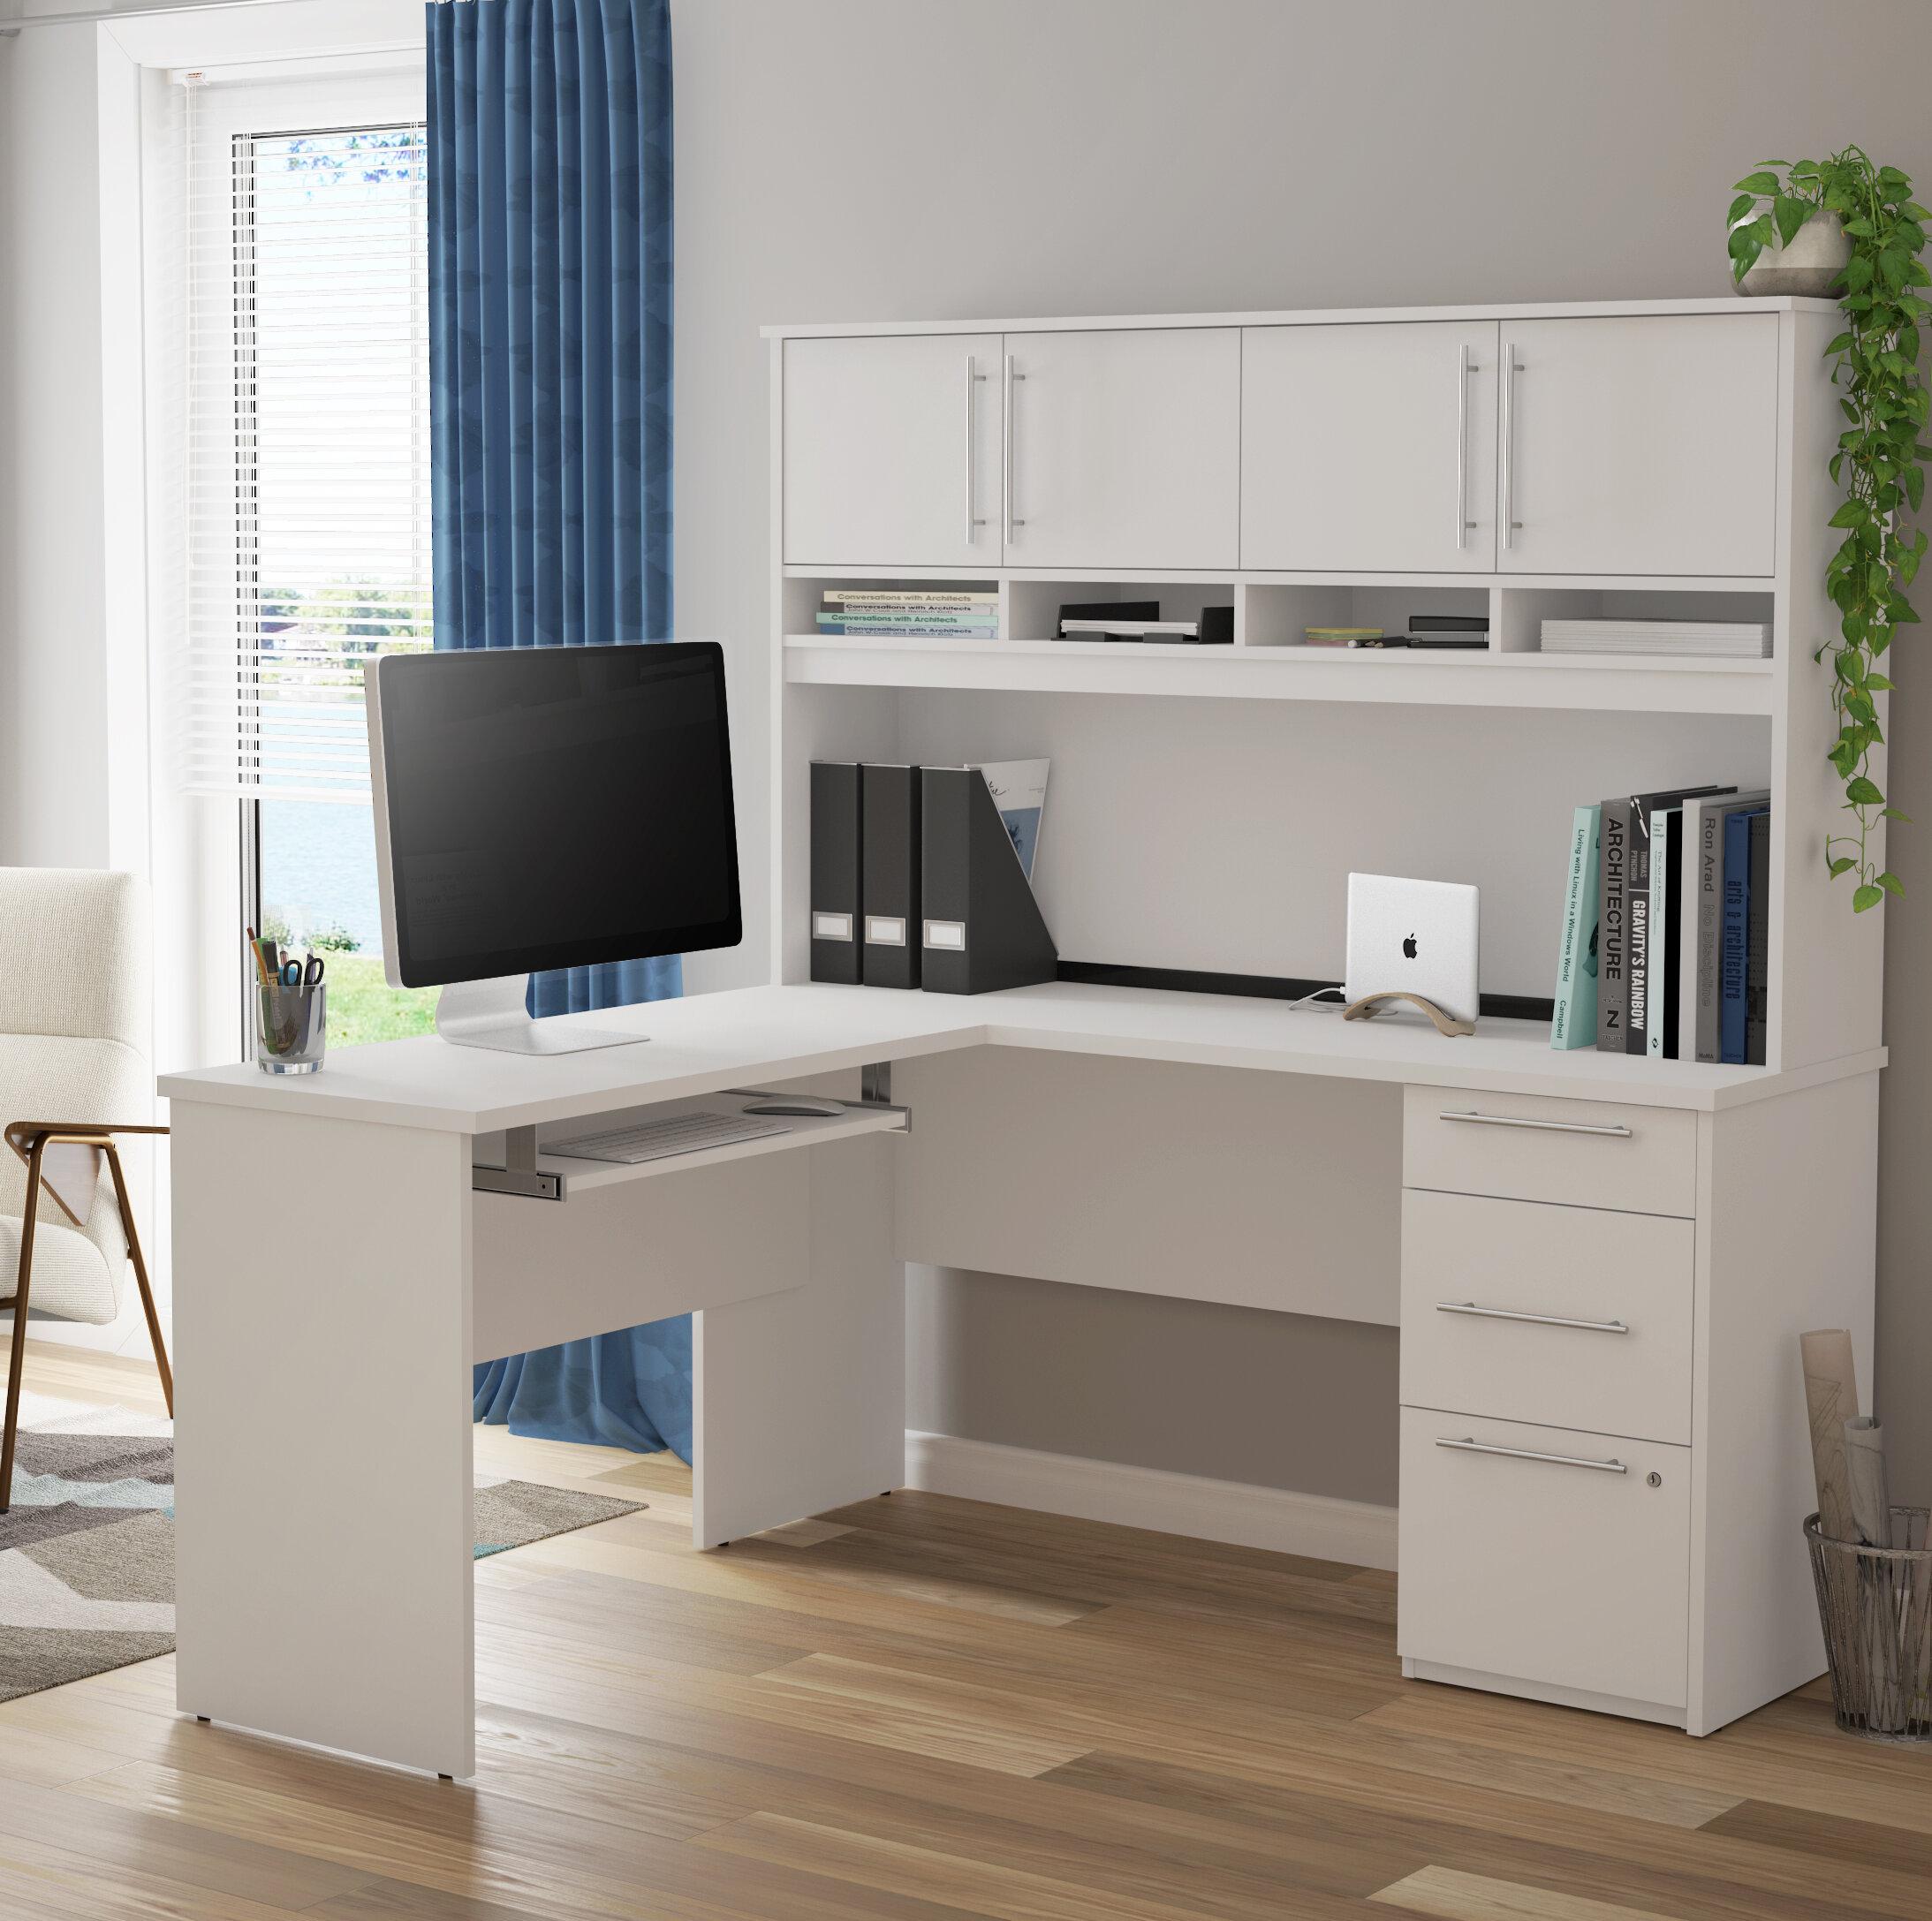 Altha Plus L Shaped Computer Desk With Hutch